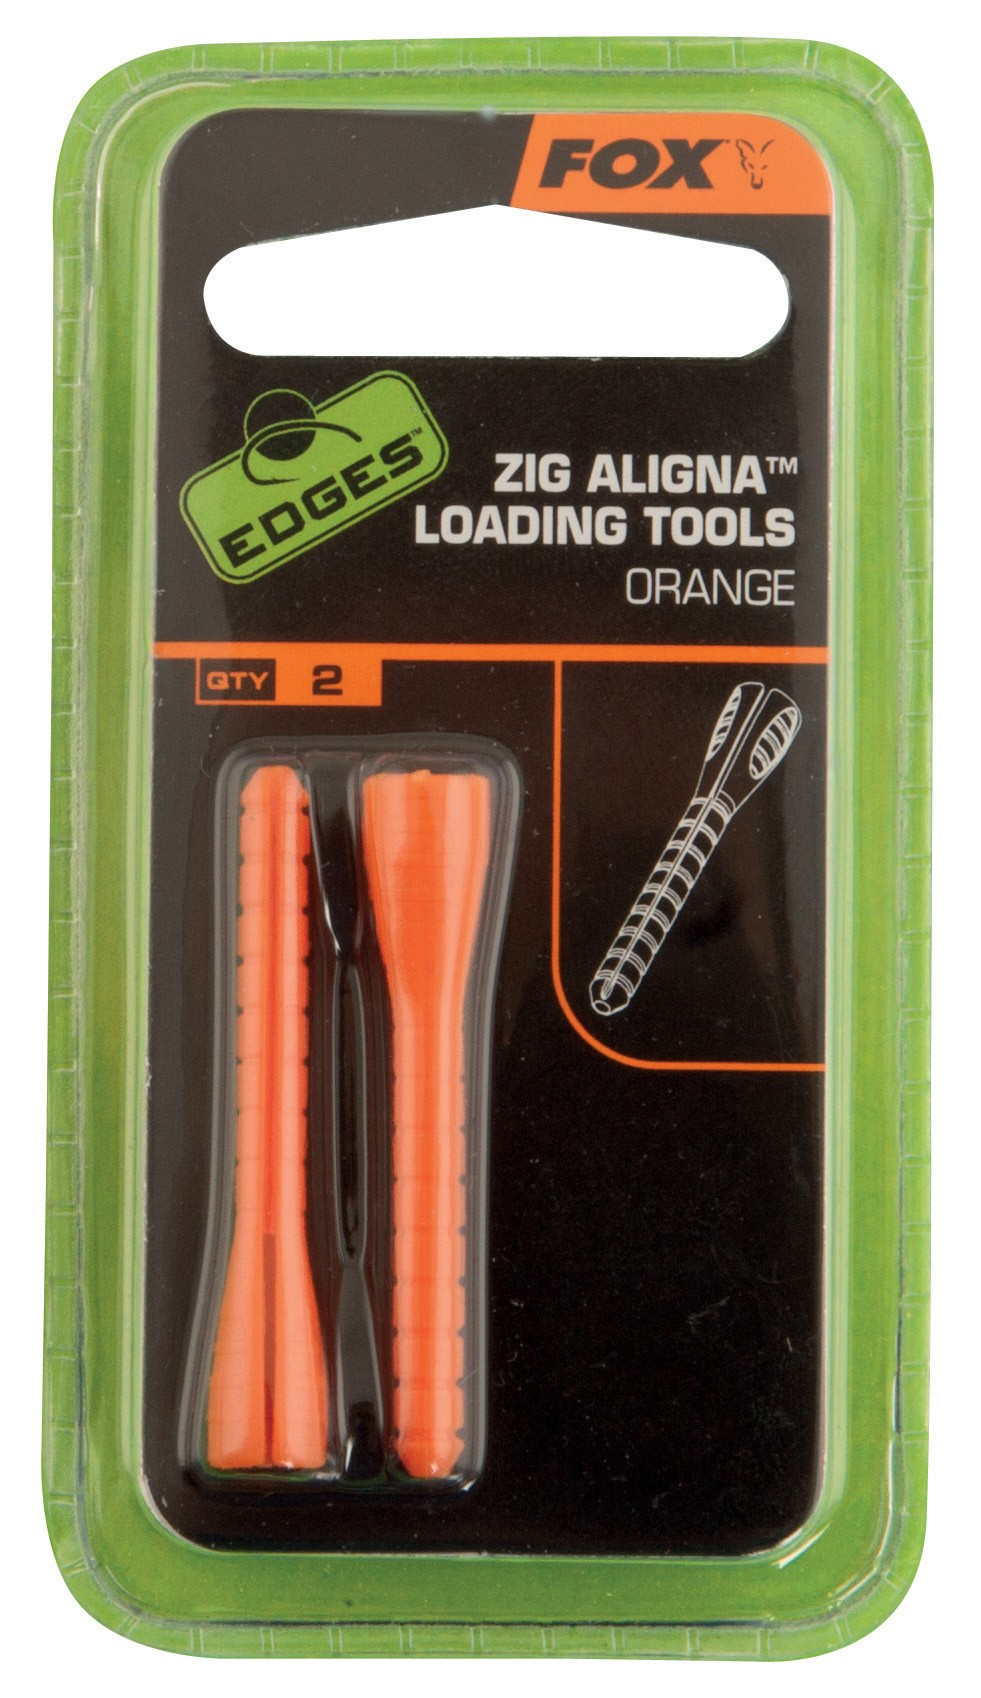 Fox Zig Aligna Loading Tools Orange